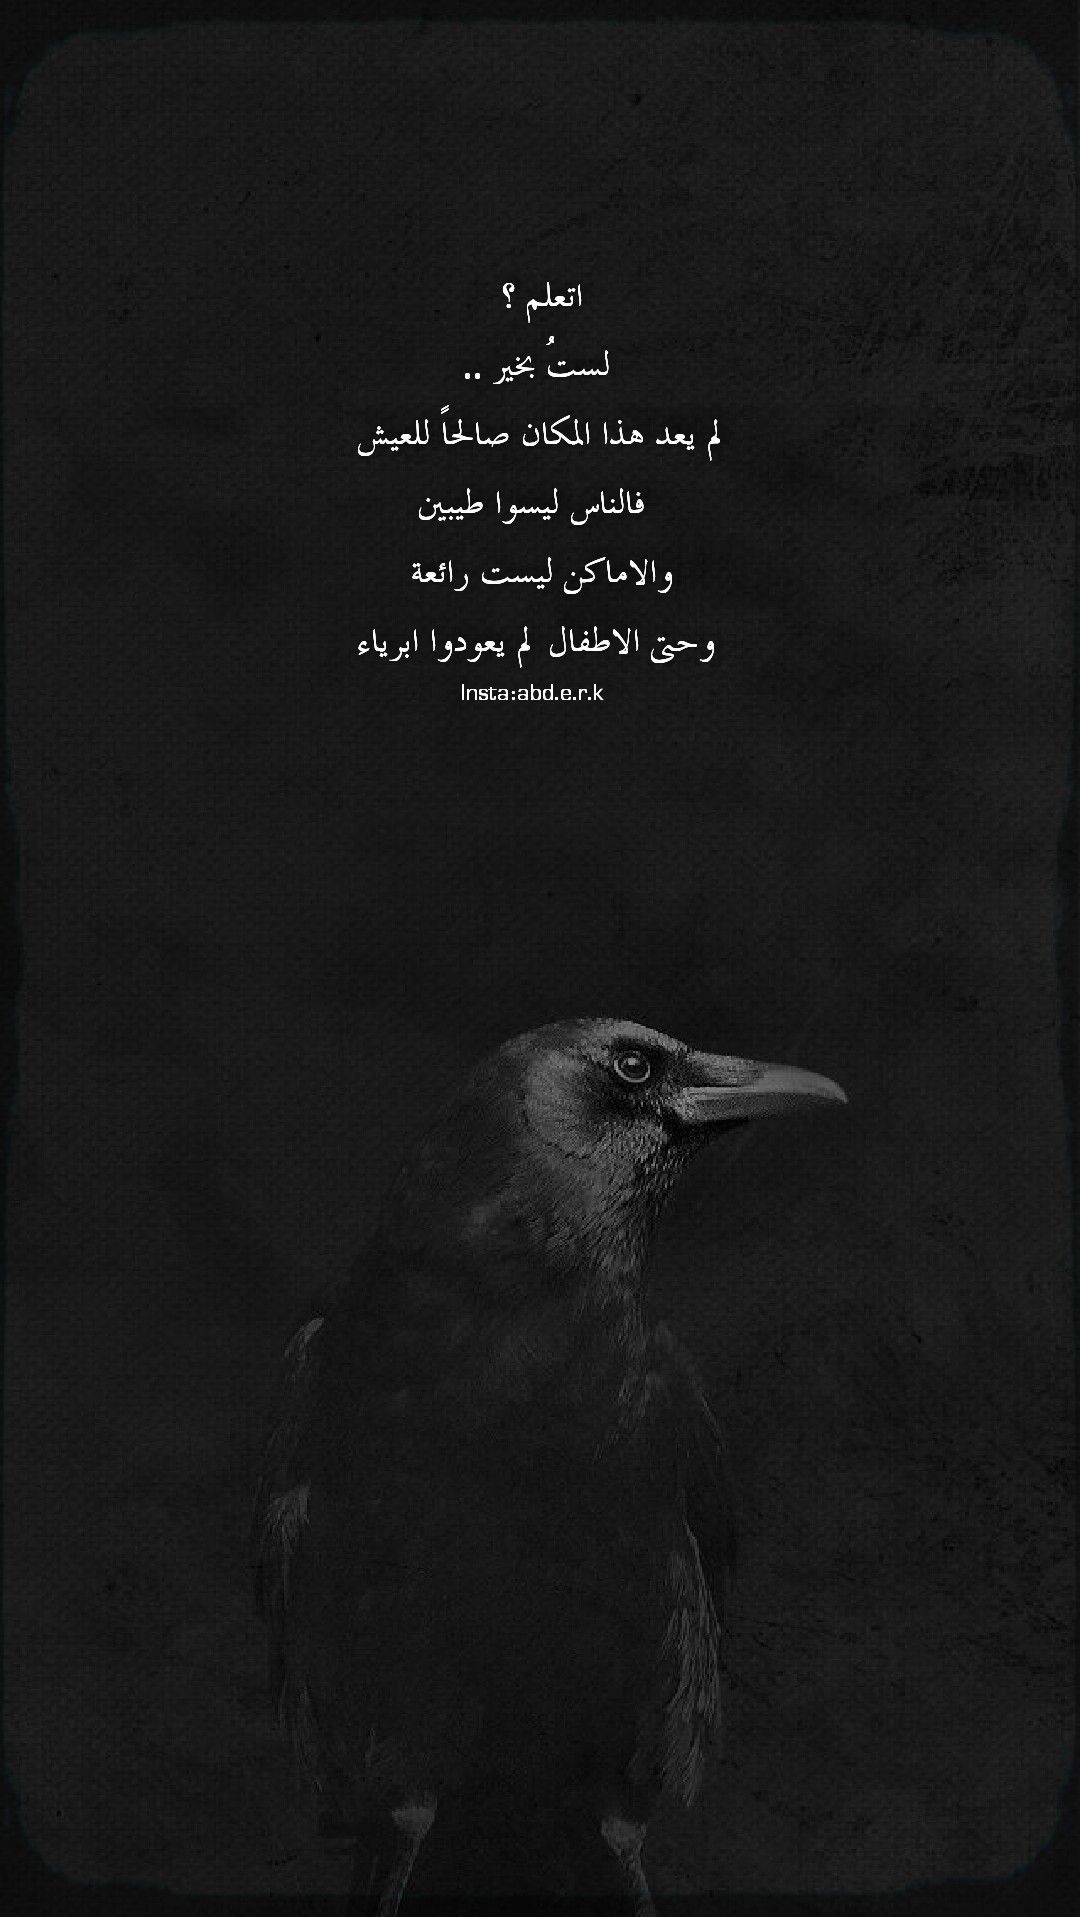 لم أعد بخير Quotations Arabic Quotes Quotes